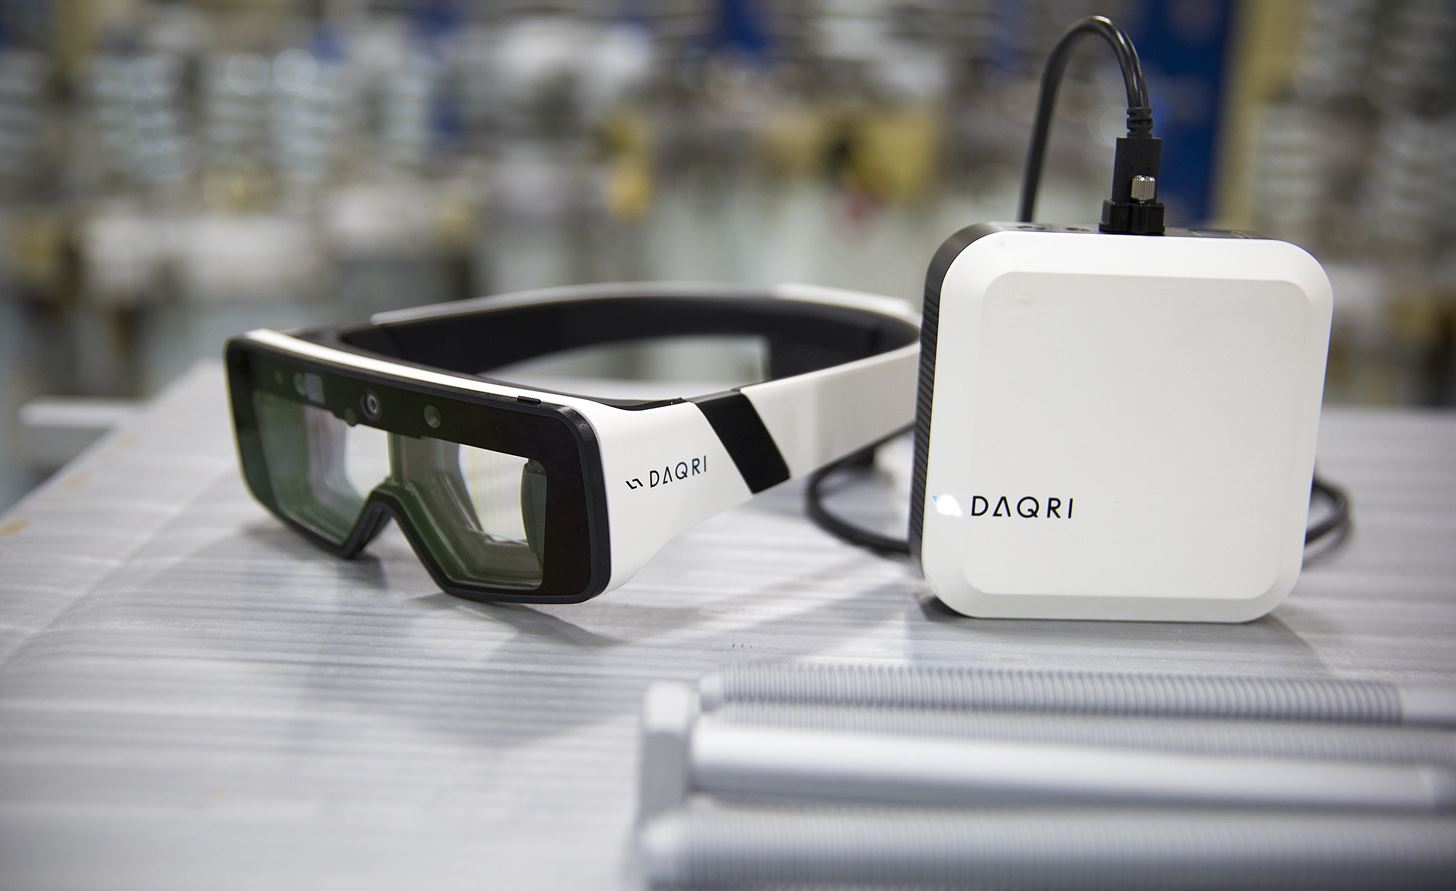 Daqri's Patent Portfolio & Trademarks Put Up for Sale